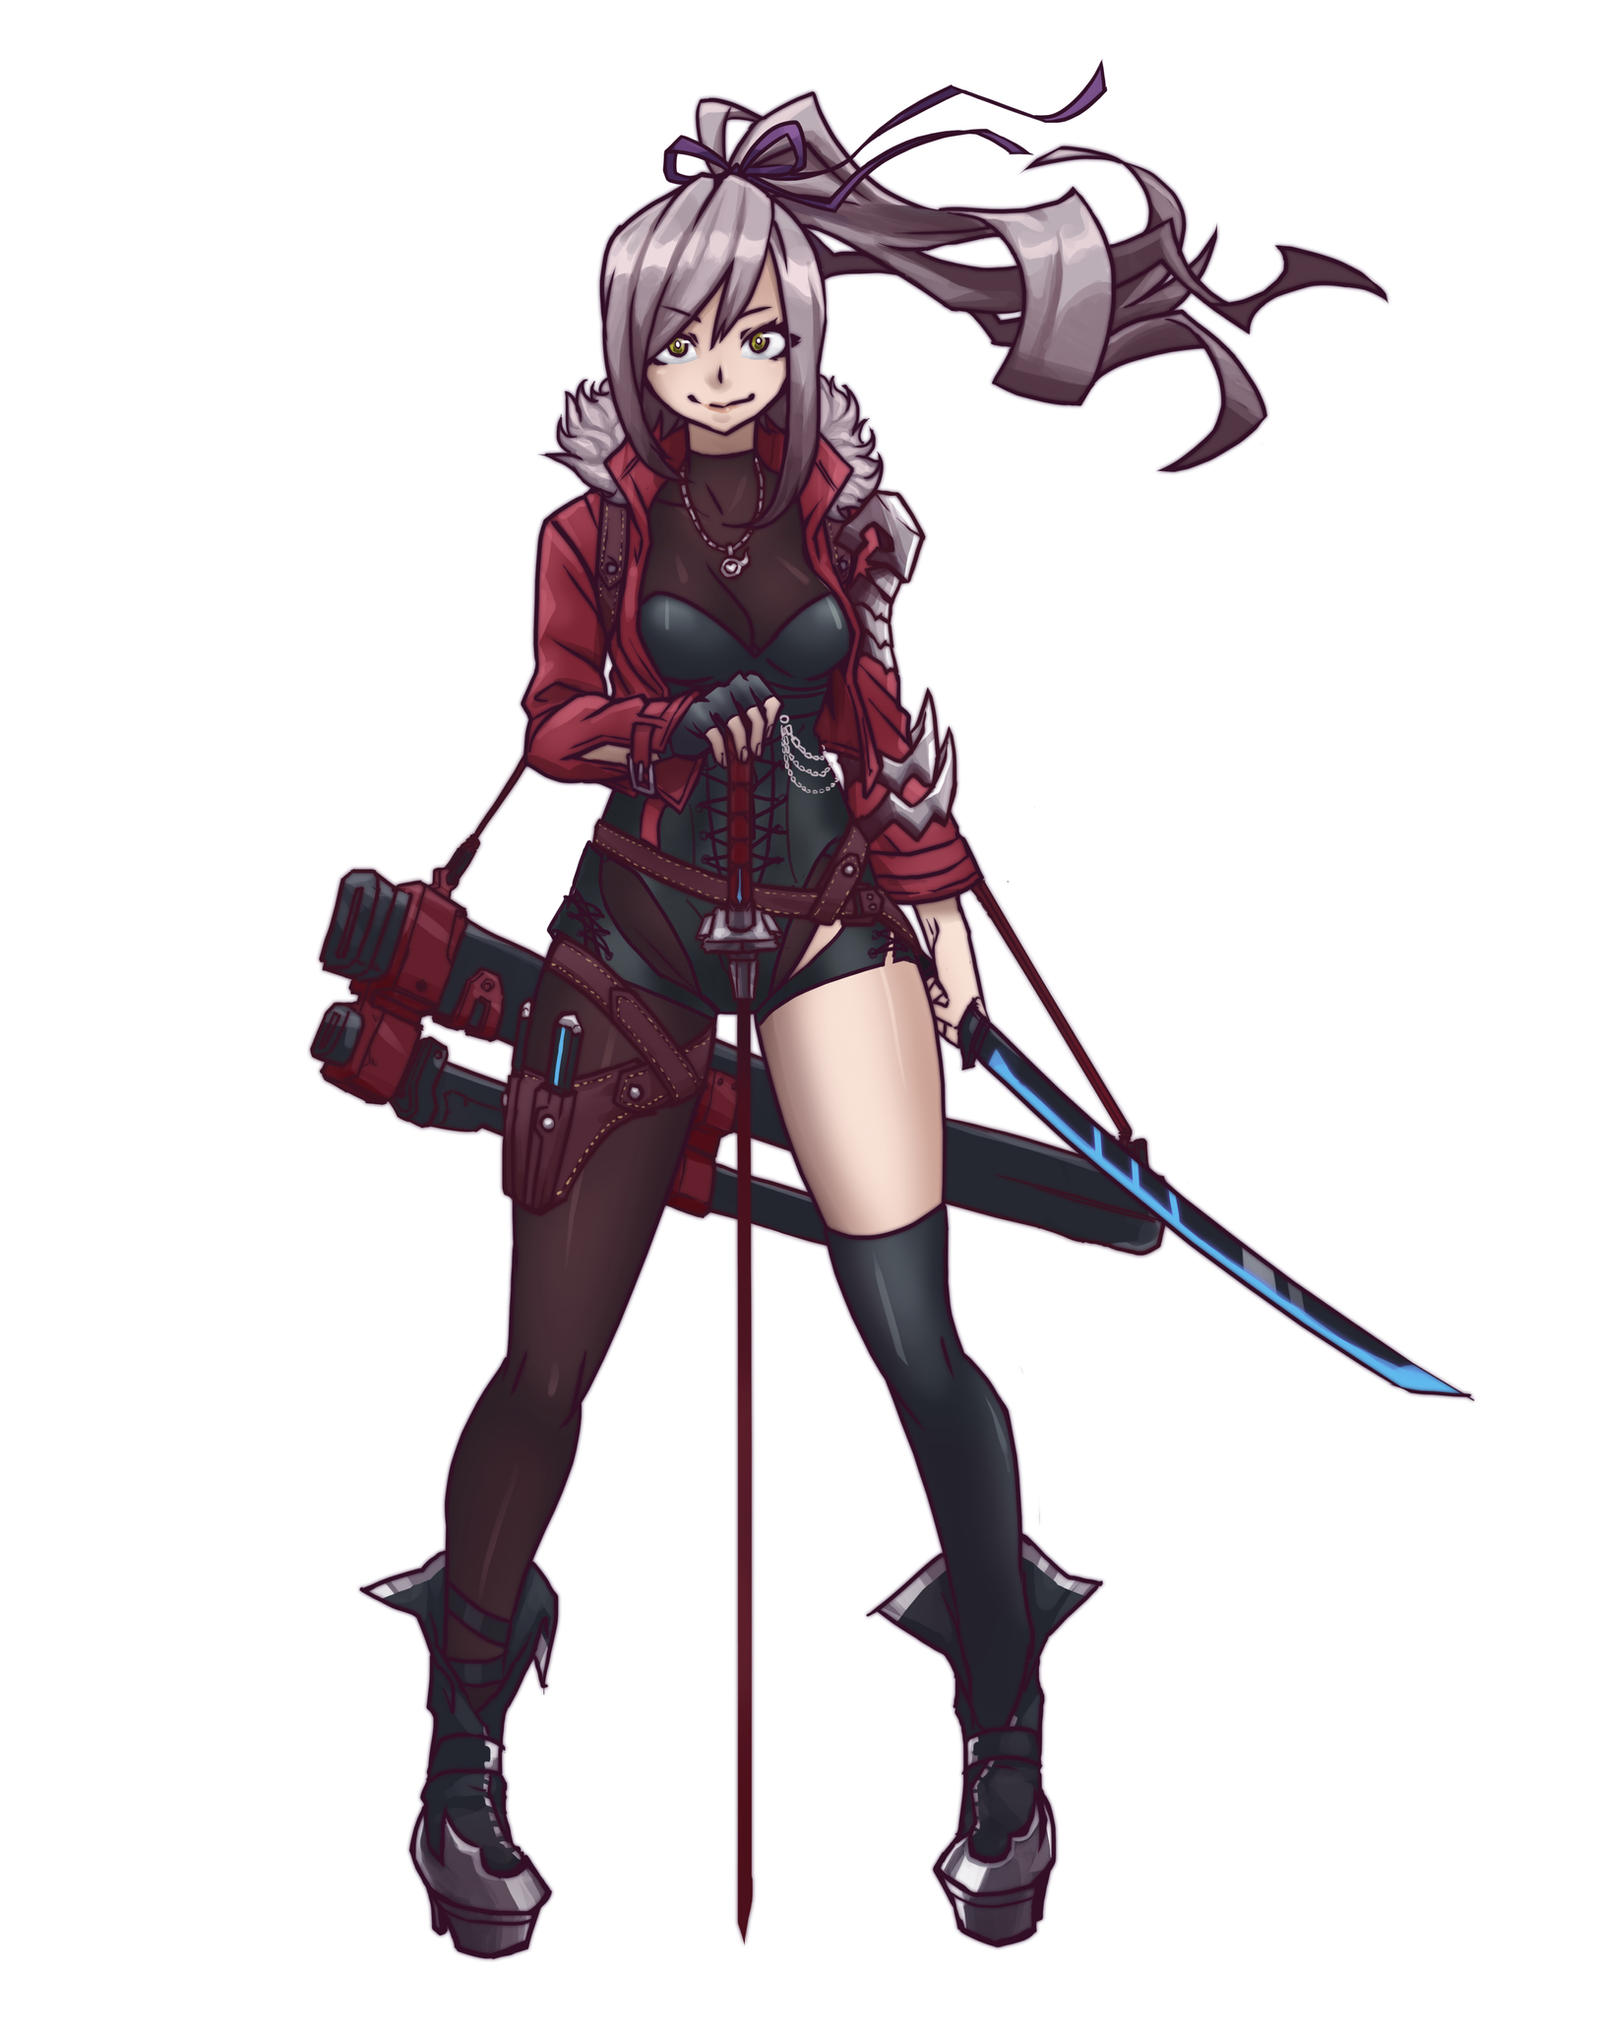 Anime Characters Using Sword : Swords girl by mkuchima on deviantart